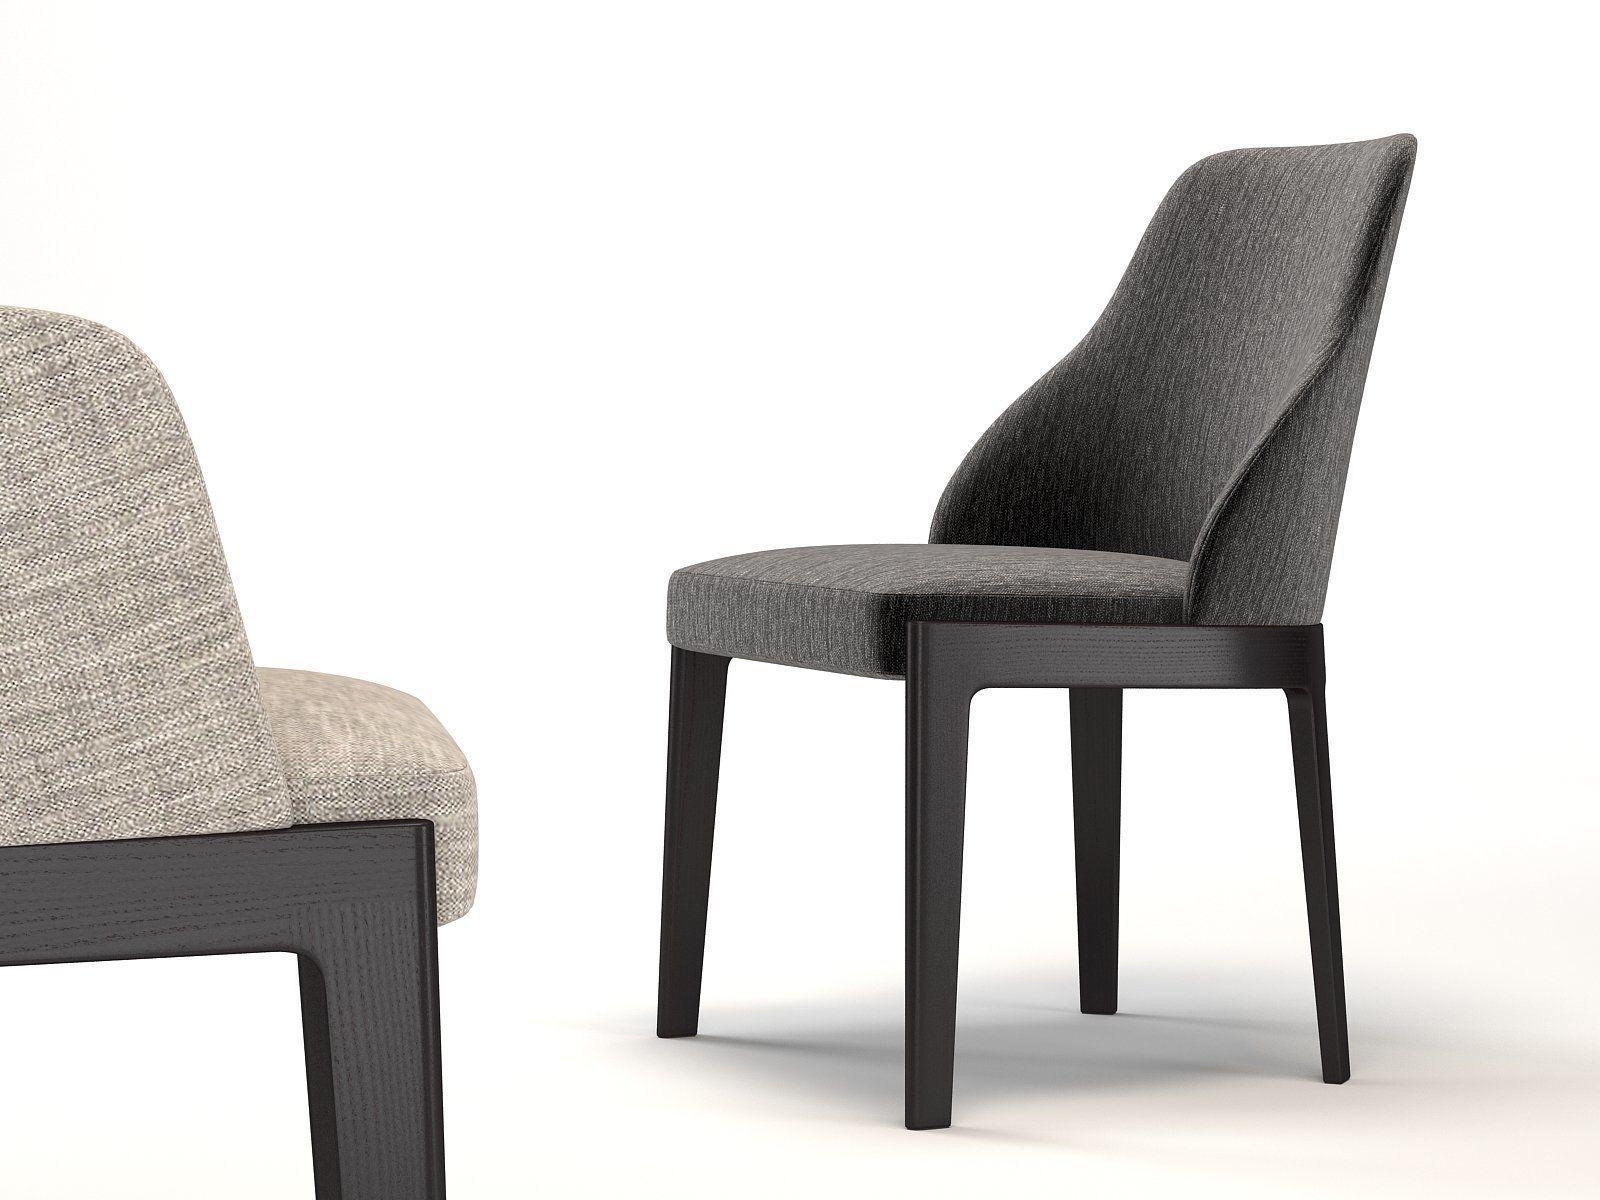 Chelsea CSE1 Chair